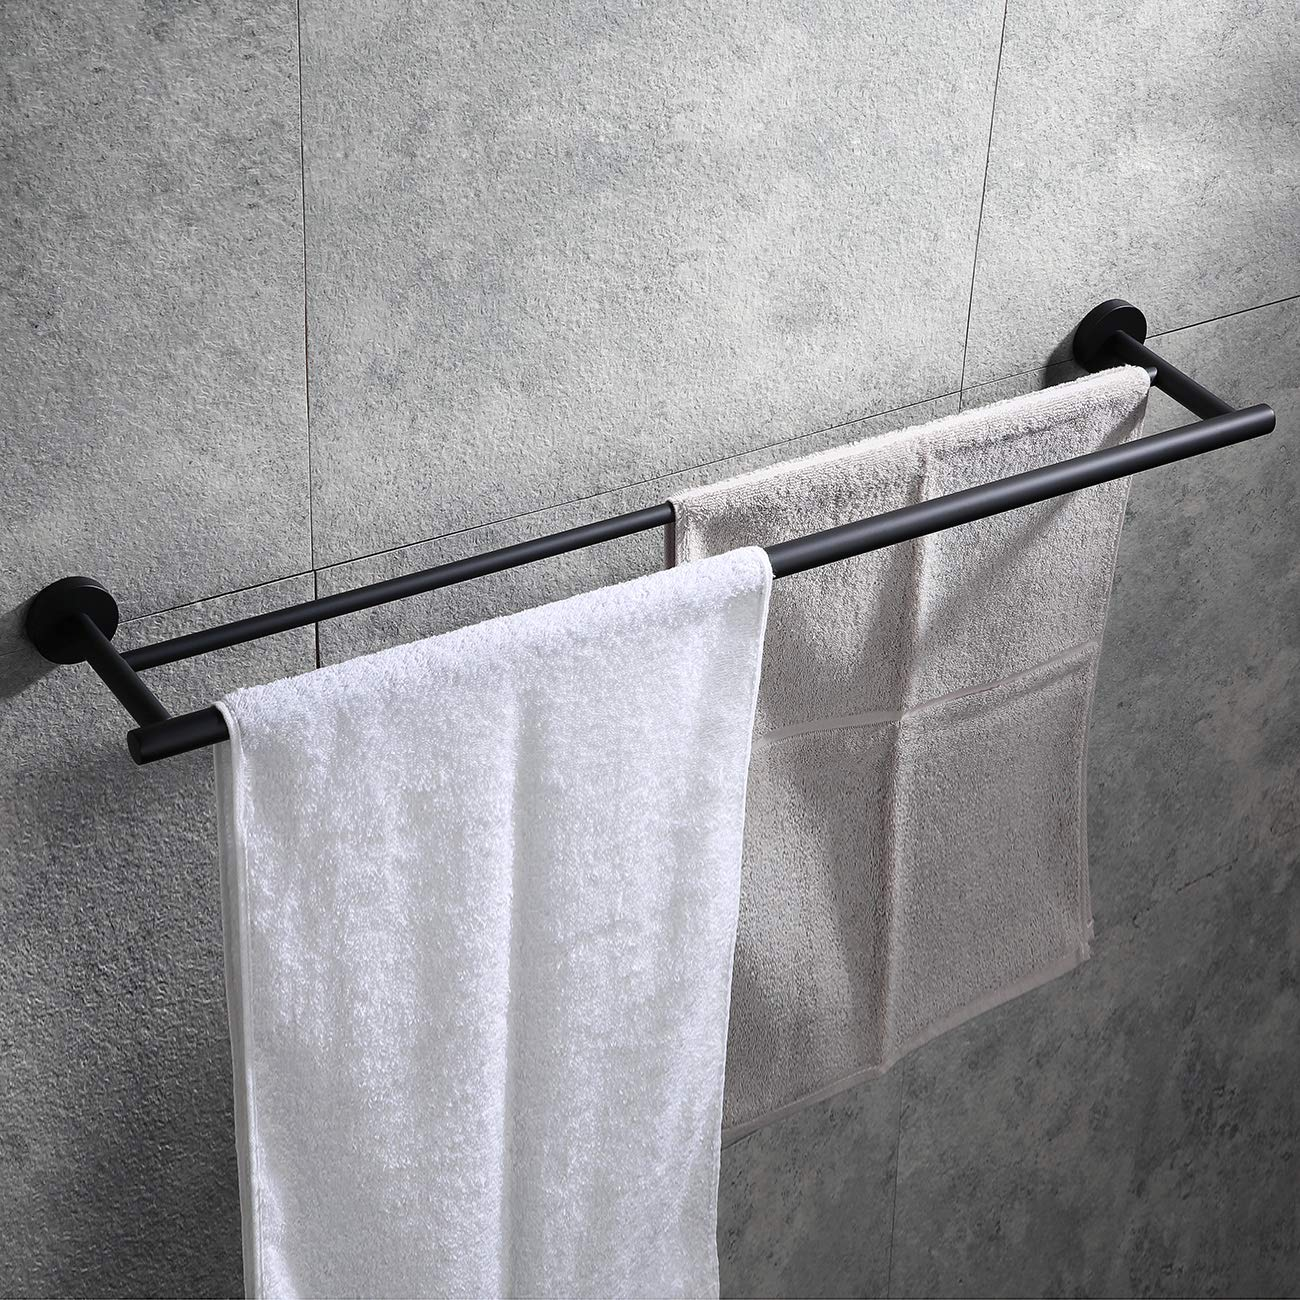 Hoooh Double Bath Towel Bar, 30-Inch Matte Black Stainless Steel Hand Towel Rack for Bathroom, A102L75-BK